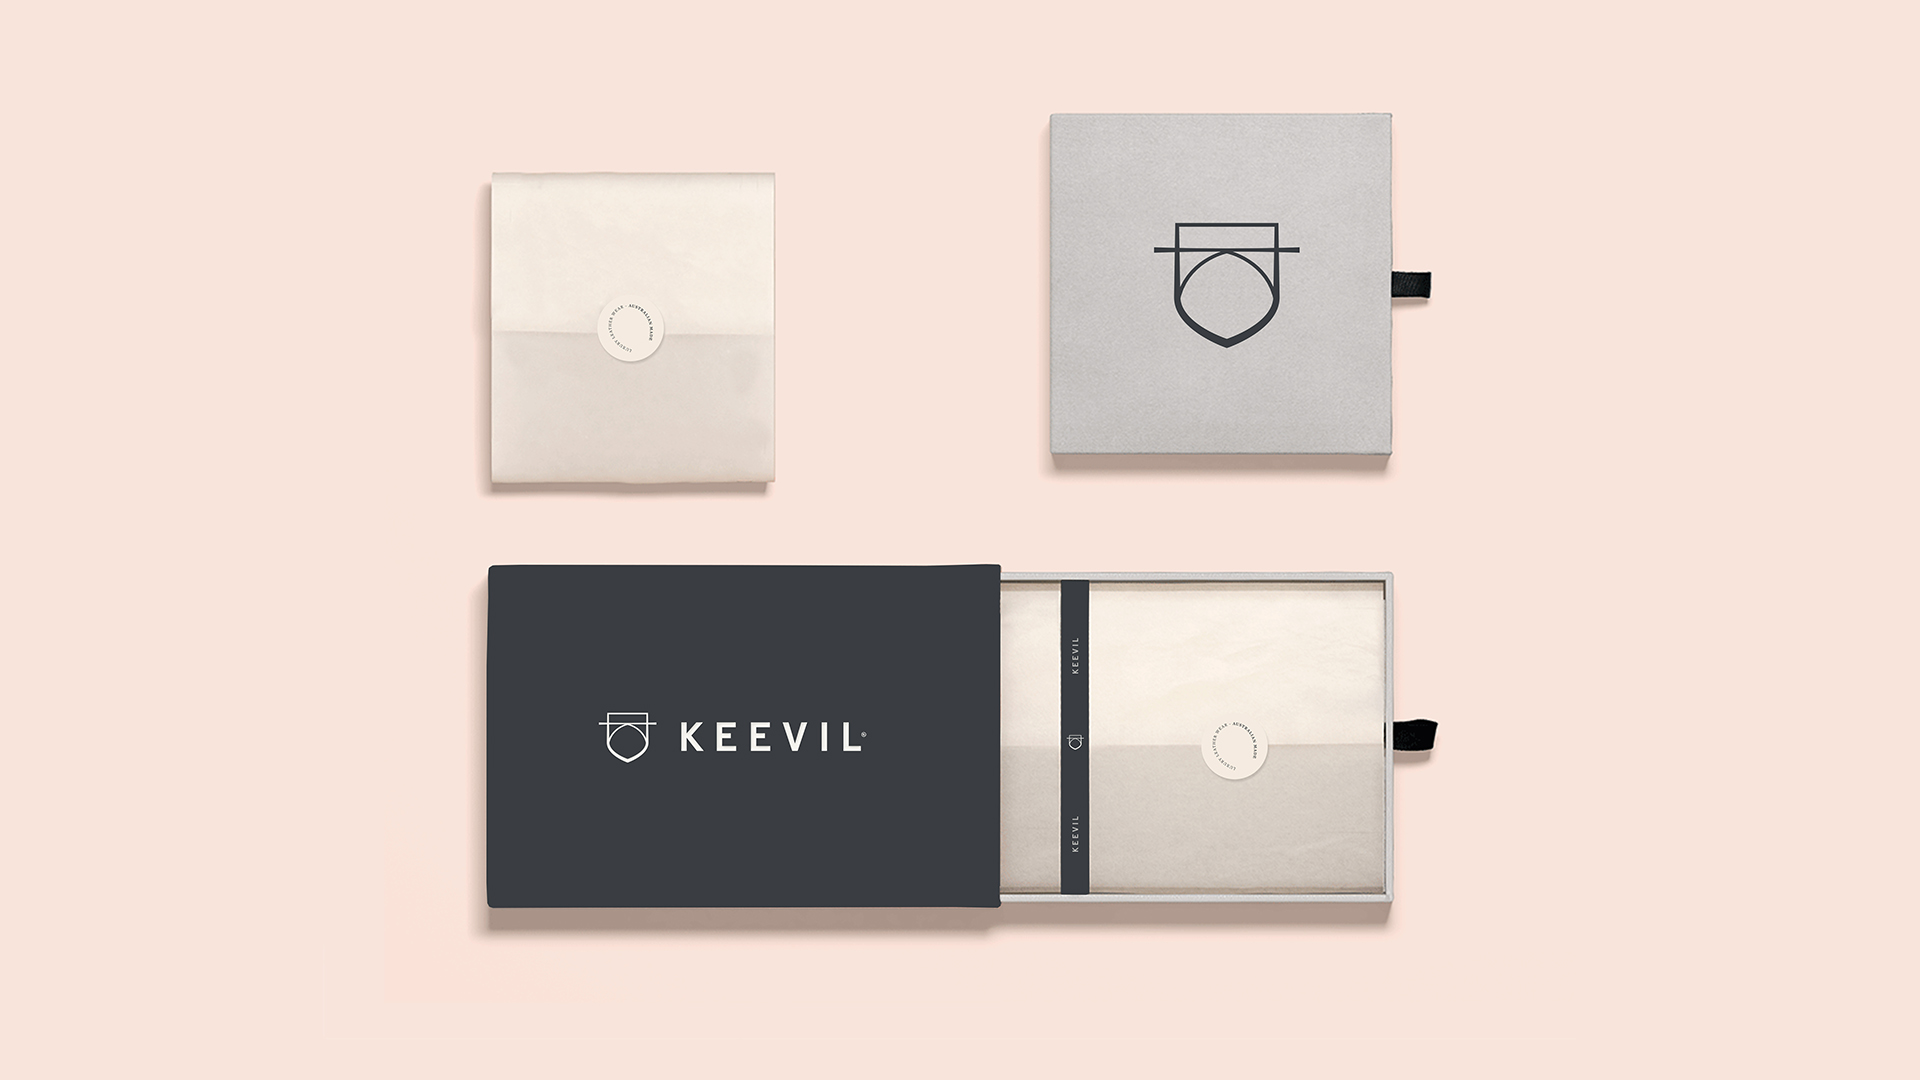 keevil.psdArtboard 1 copy 4_3.jpg